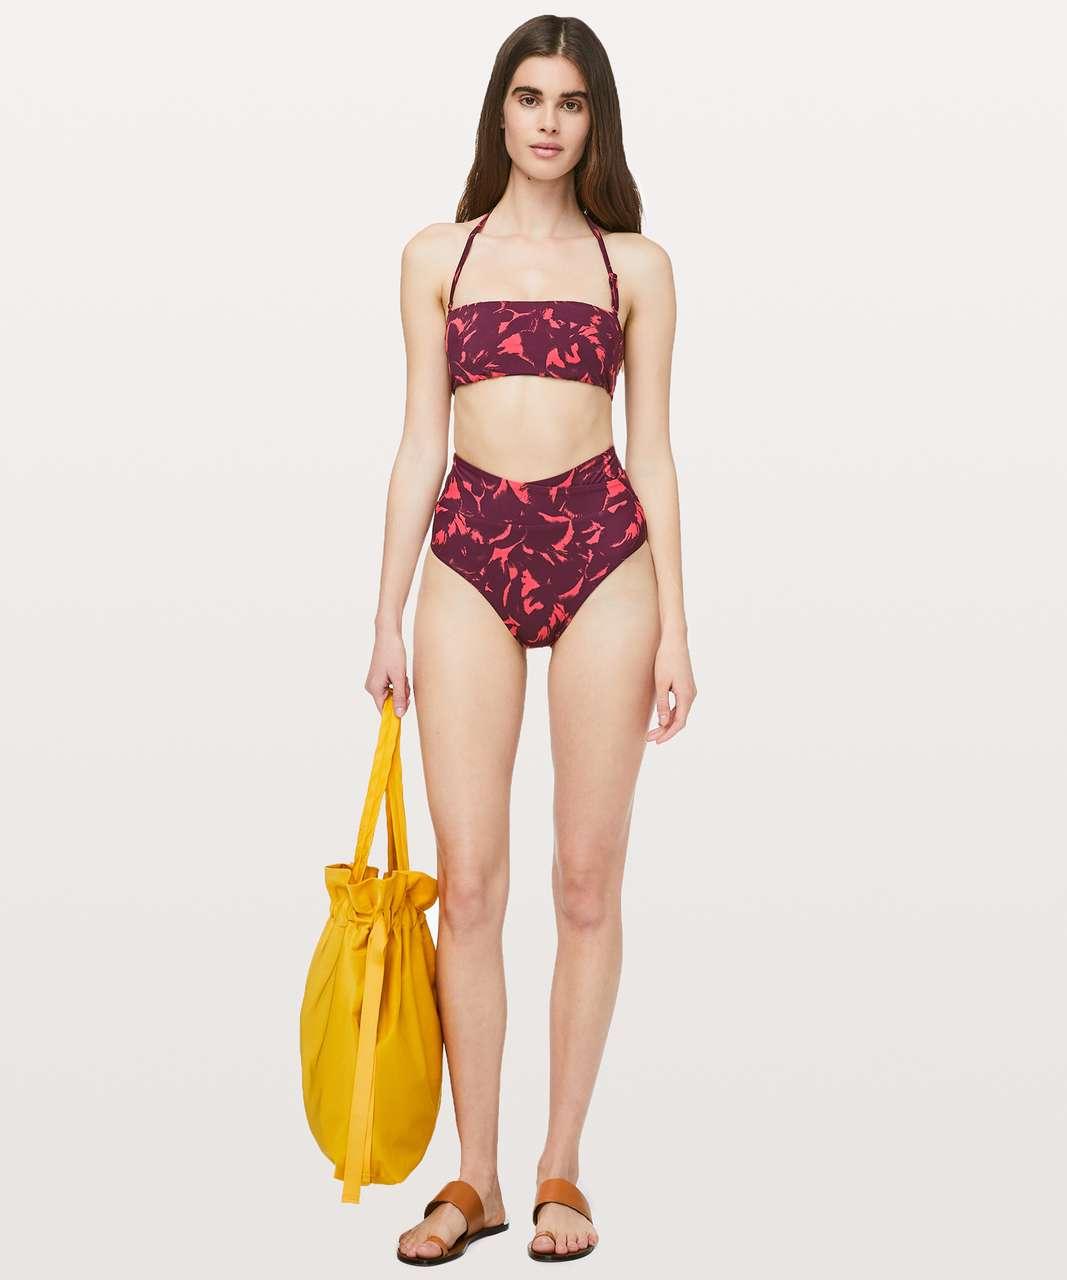 Lululemon Coastal Call Bikini Top *Reversible - Mini Flower Pop Poppy Coral Deep Ruby / Poppy Coral